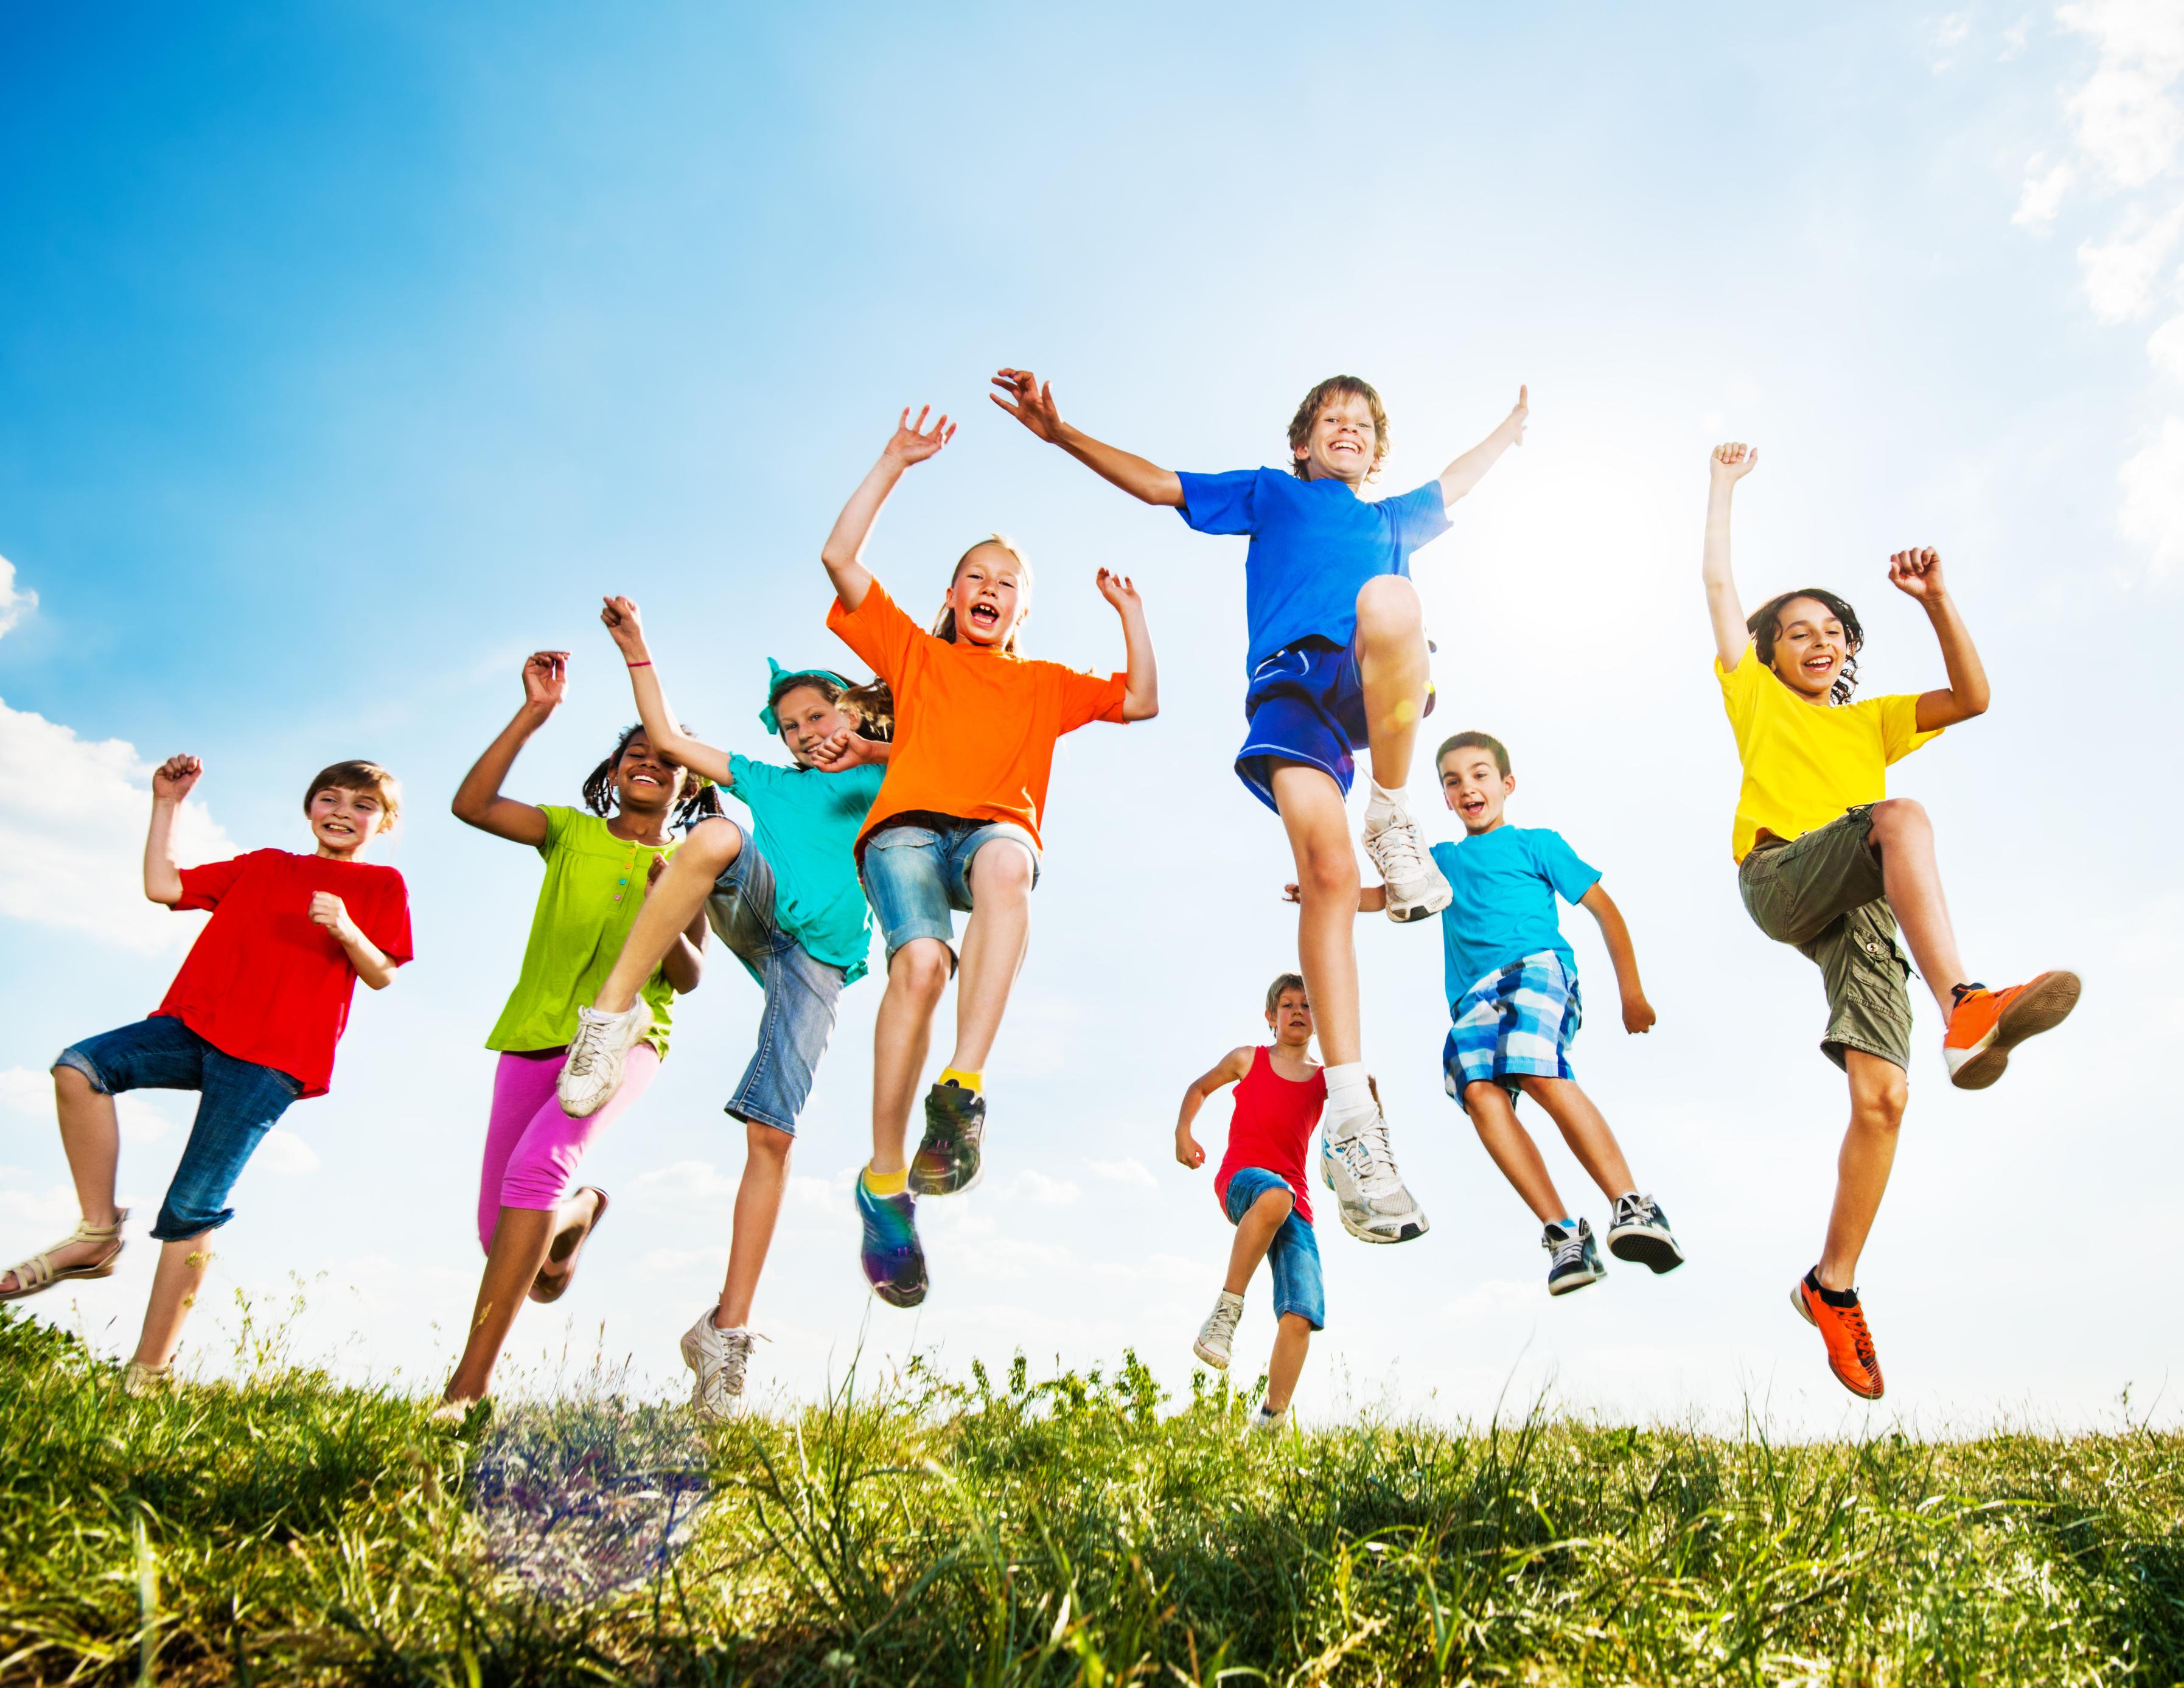 Kids jumping in a field